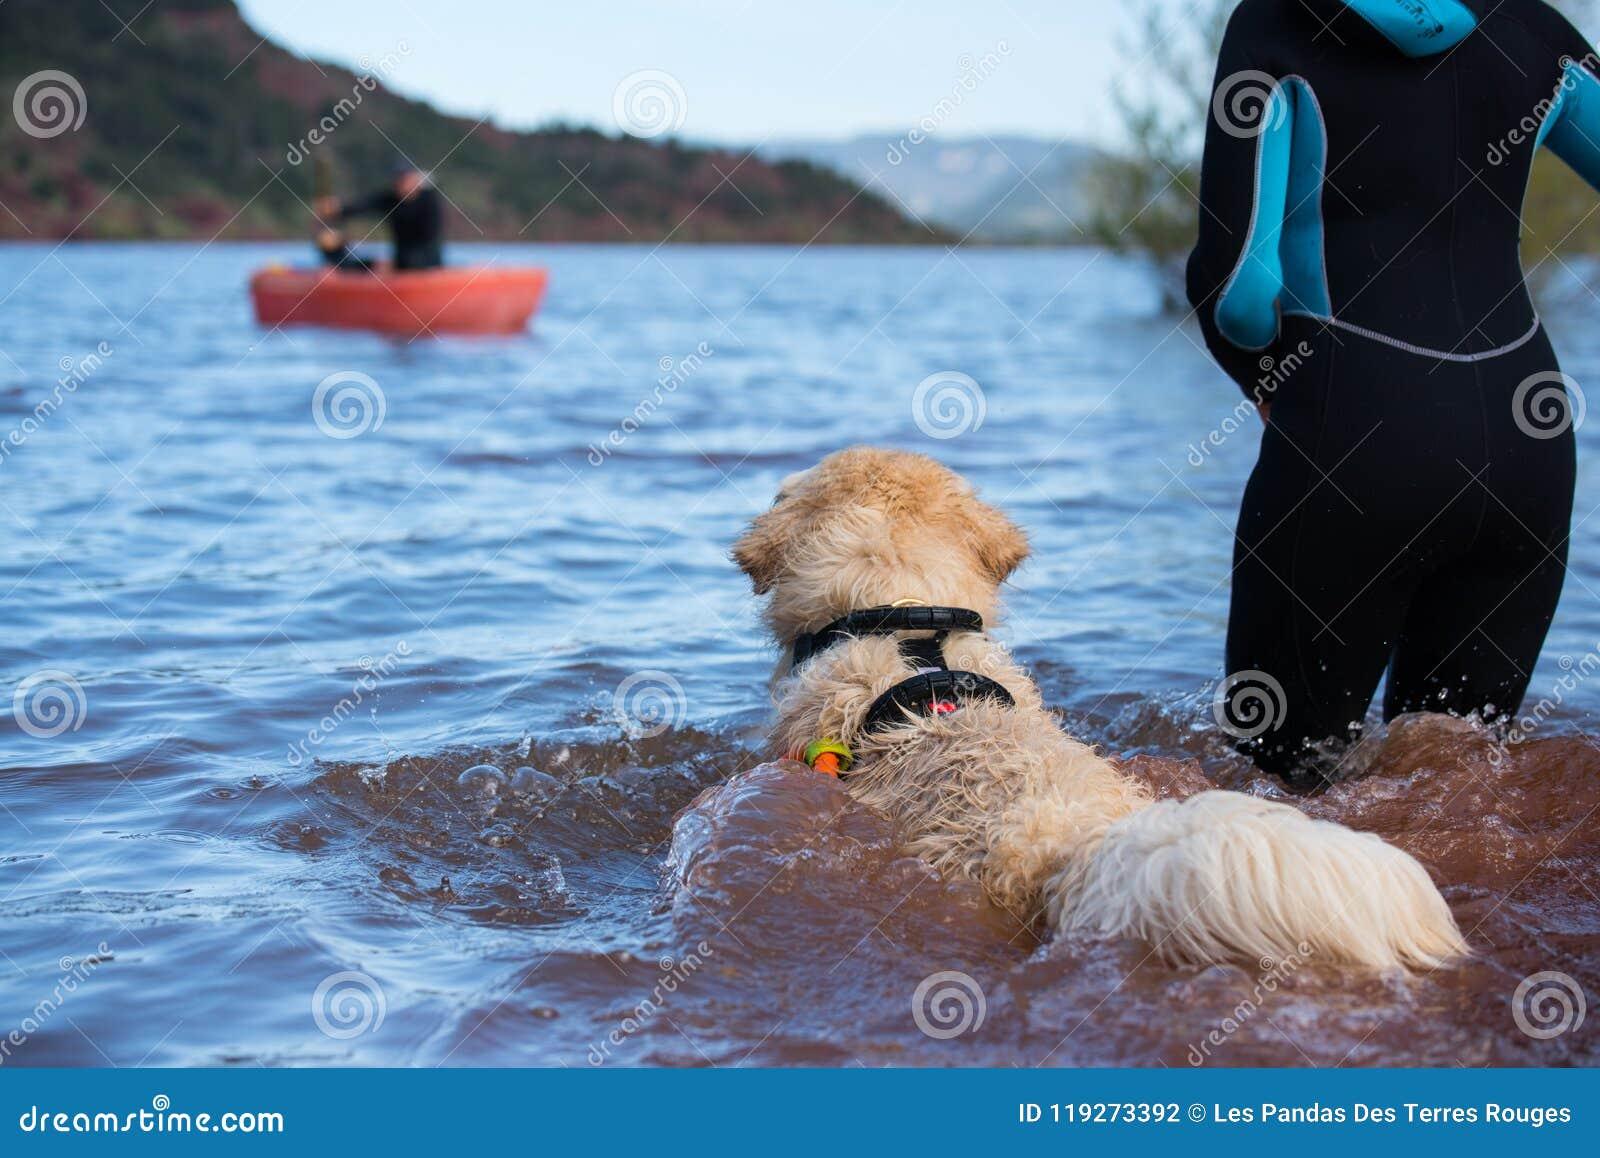 Labrador Golden Retriever Dog Pure Breed Female Puppy Stock Photo